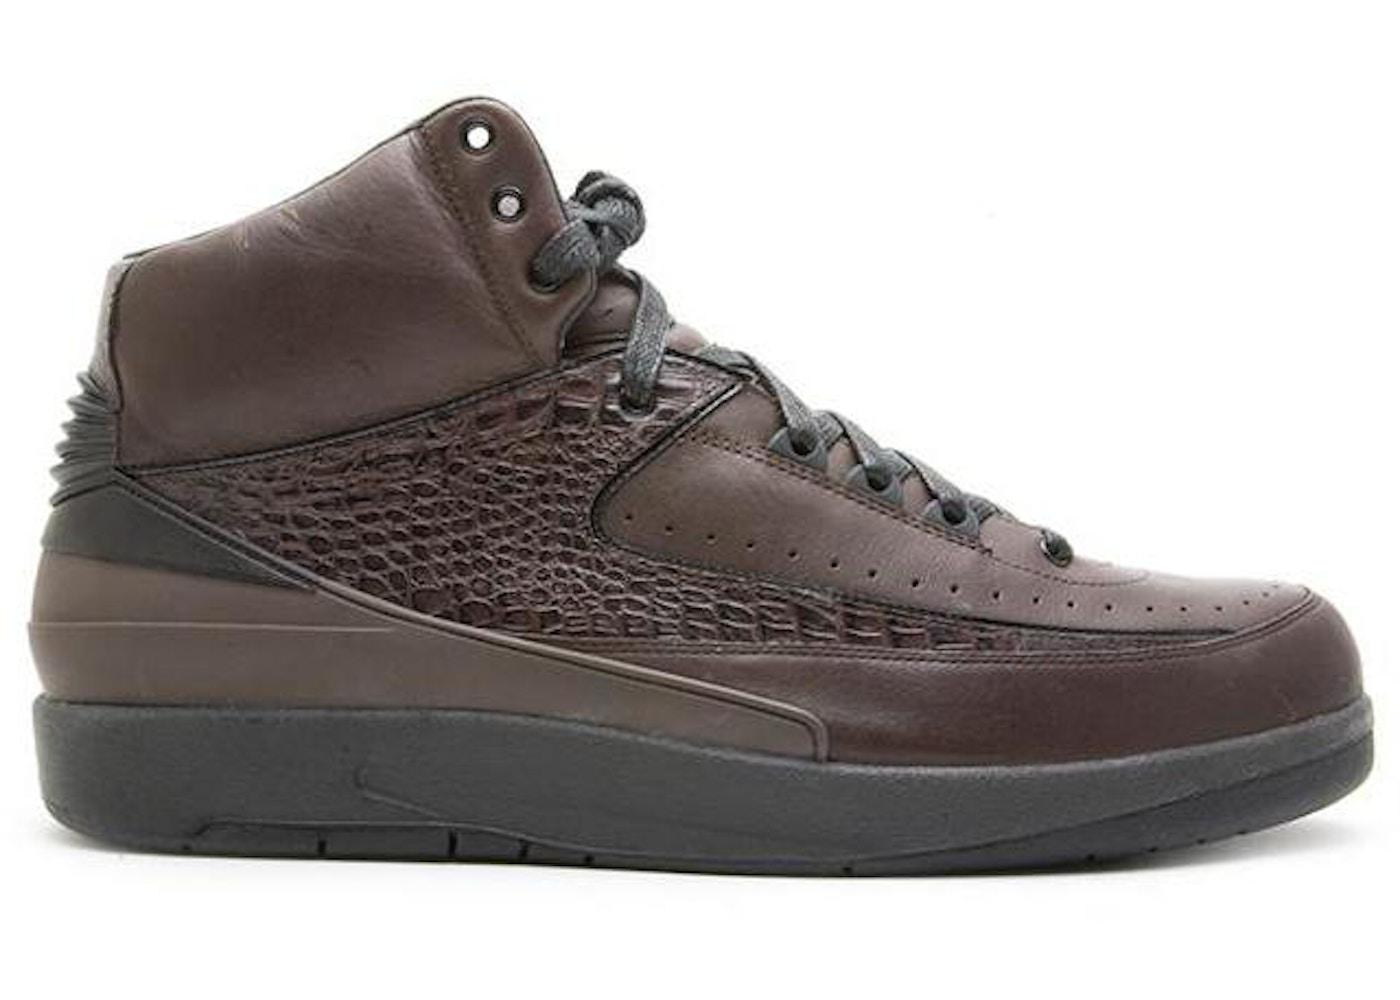 detailed look 9b8bc be785 Buy Air Jordan 2 Size 17 Shoes   Deadstock Sneakers